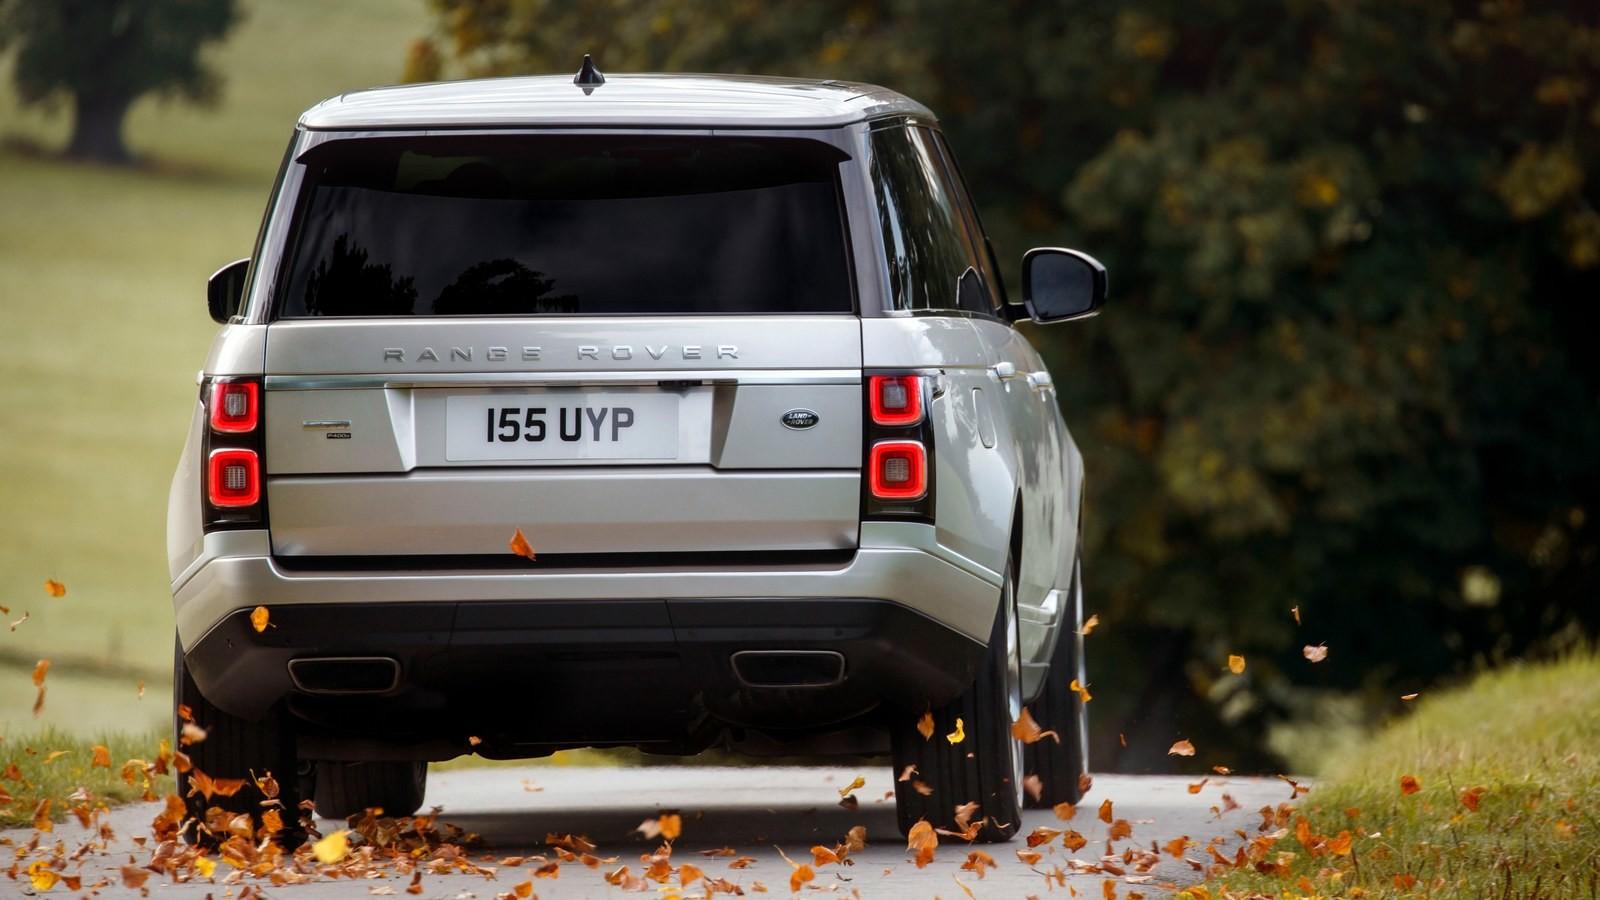 Range Rover Autobiography P400e Комплектация Цена от HSE 6 604 000 рублей Vogue 7 124 000рублей Vog